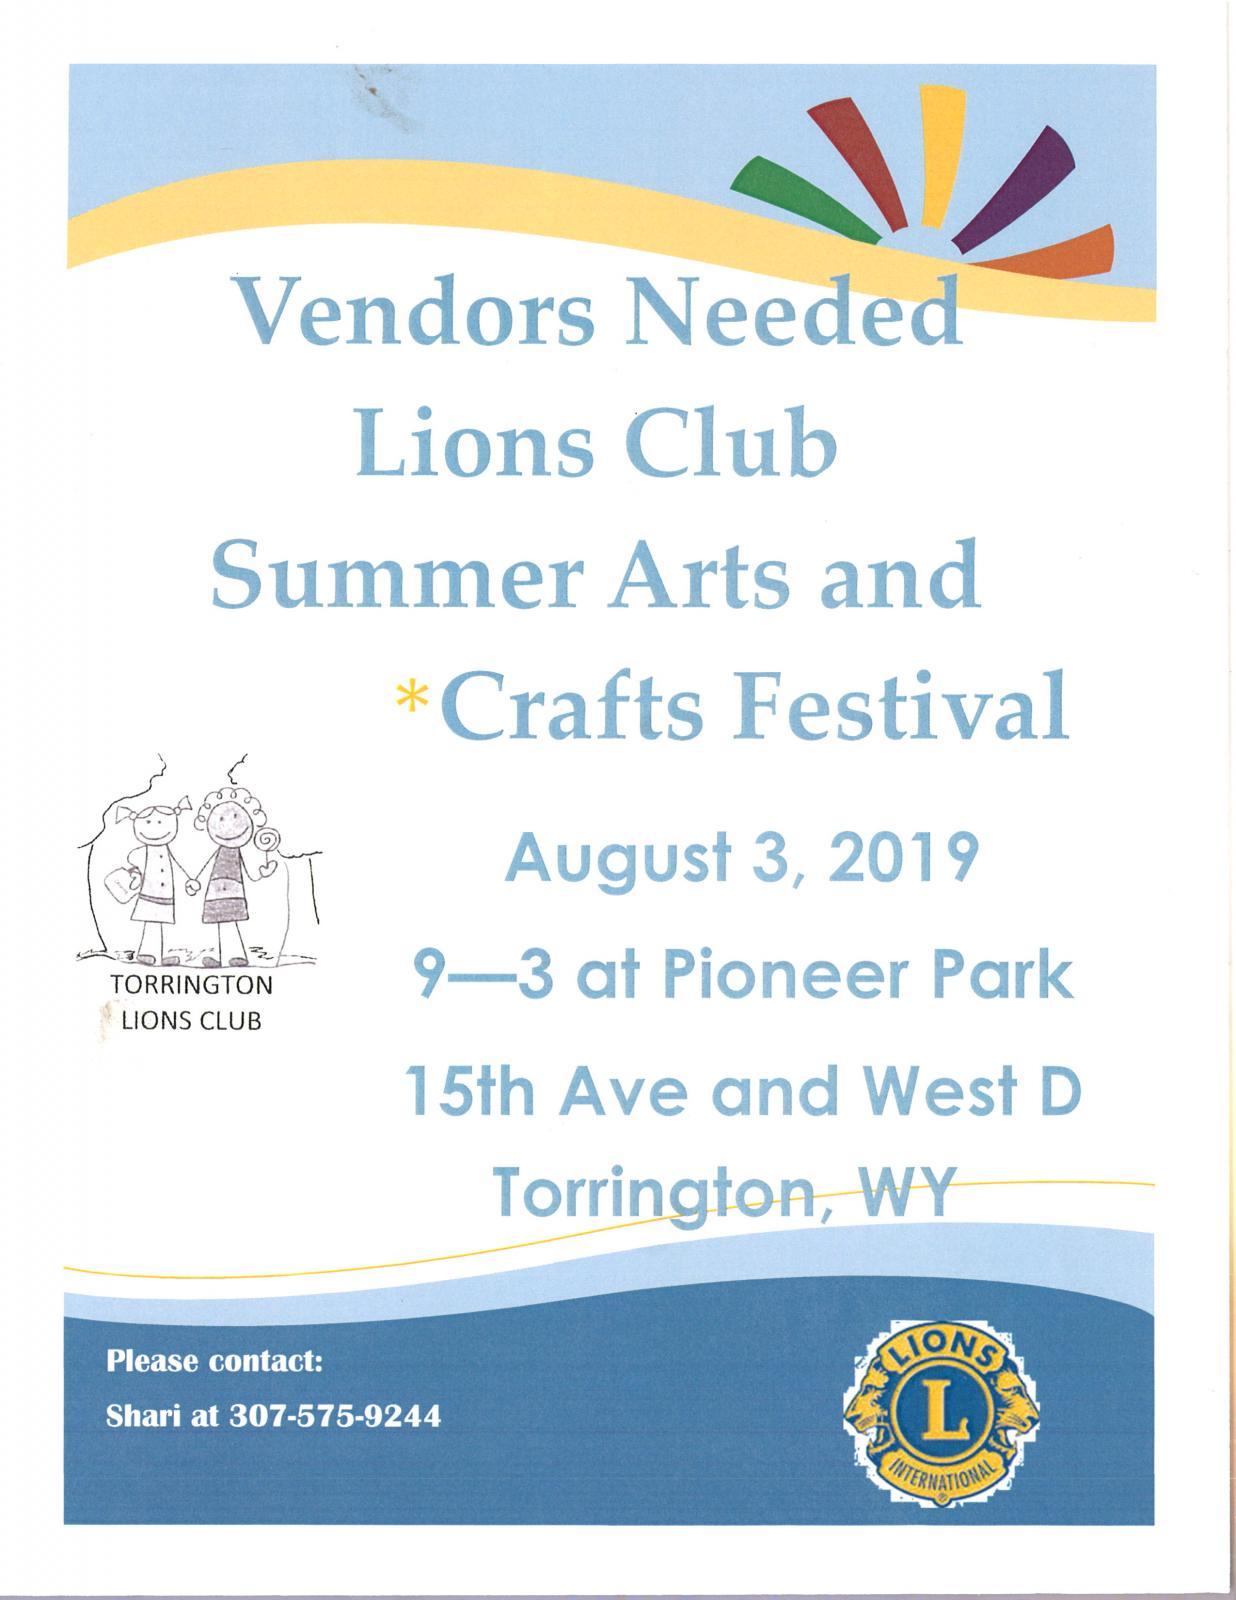 Lions Club Summer Arts & Crafts Festival Photo